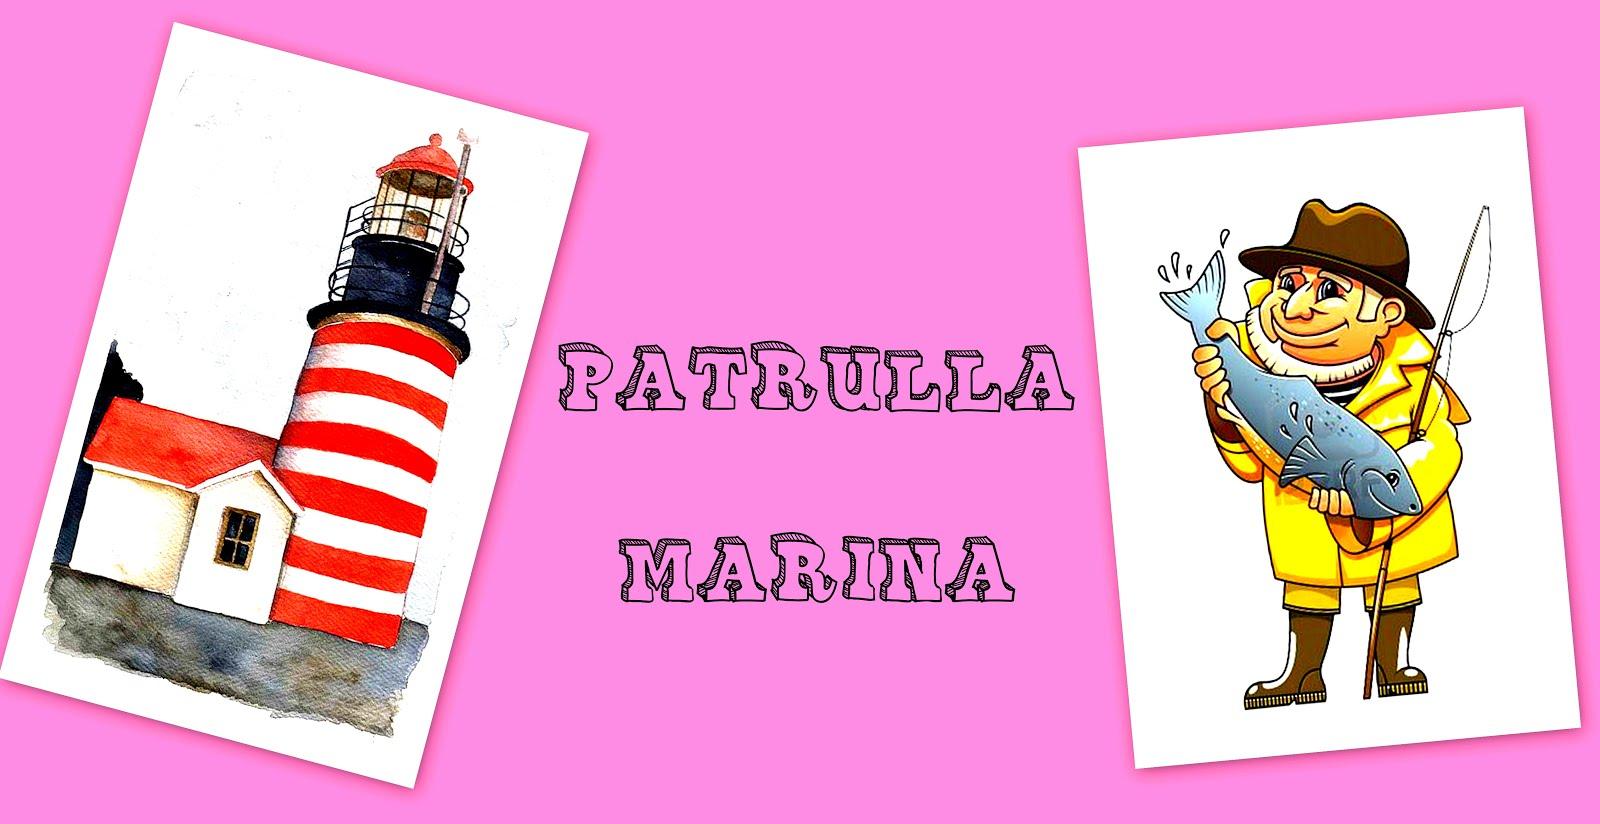 Patrulla Marina